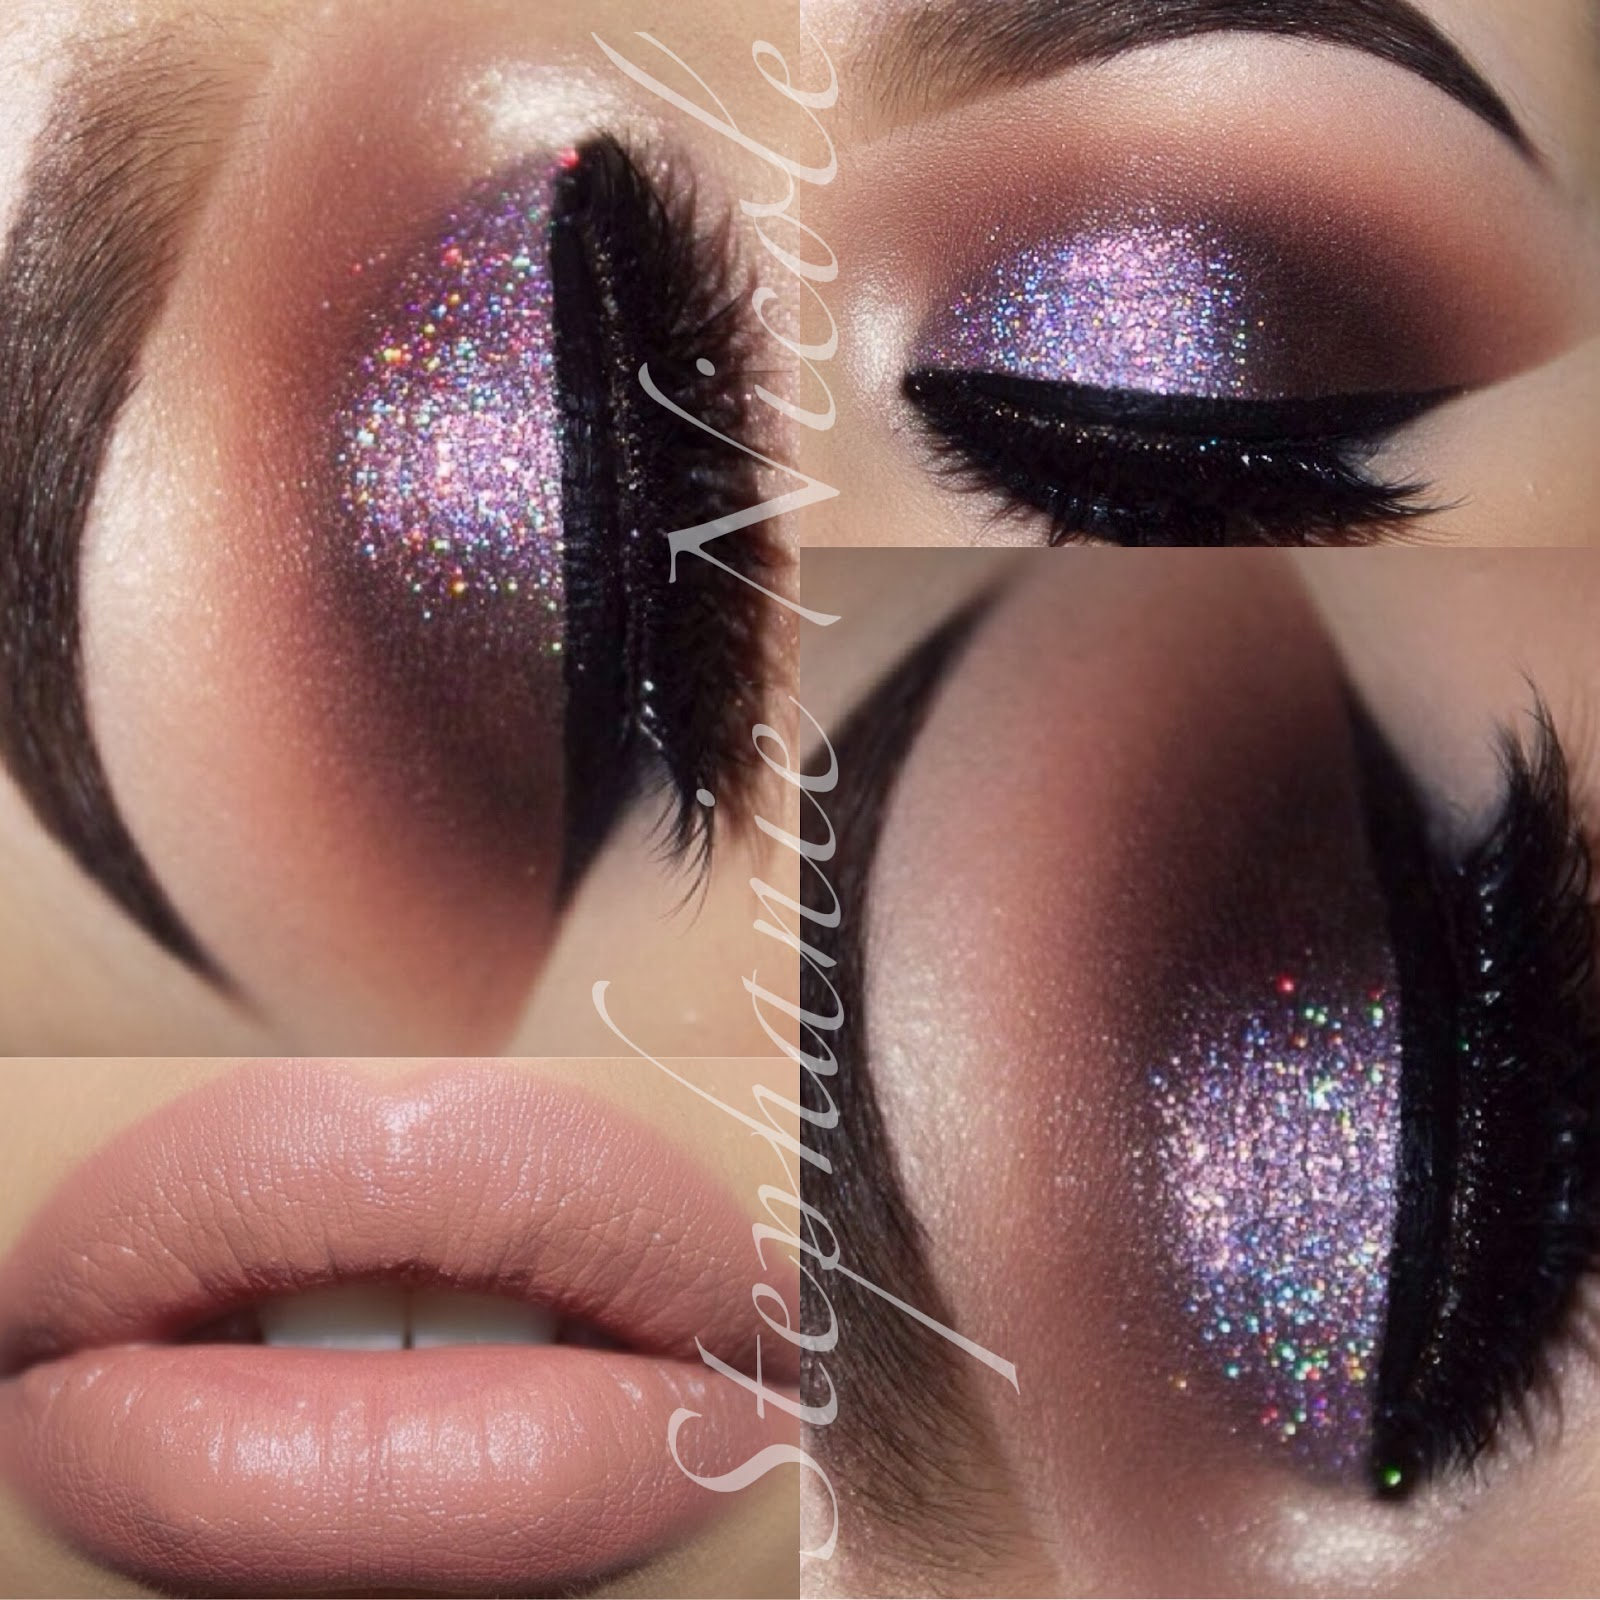 Makeup Stephanie Nicole Cocoa Glitter Too Faced